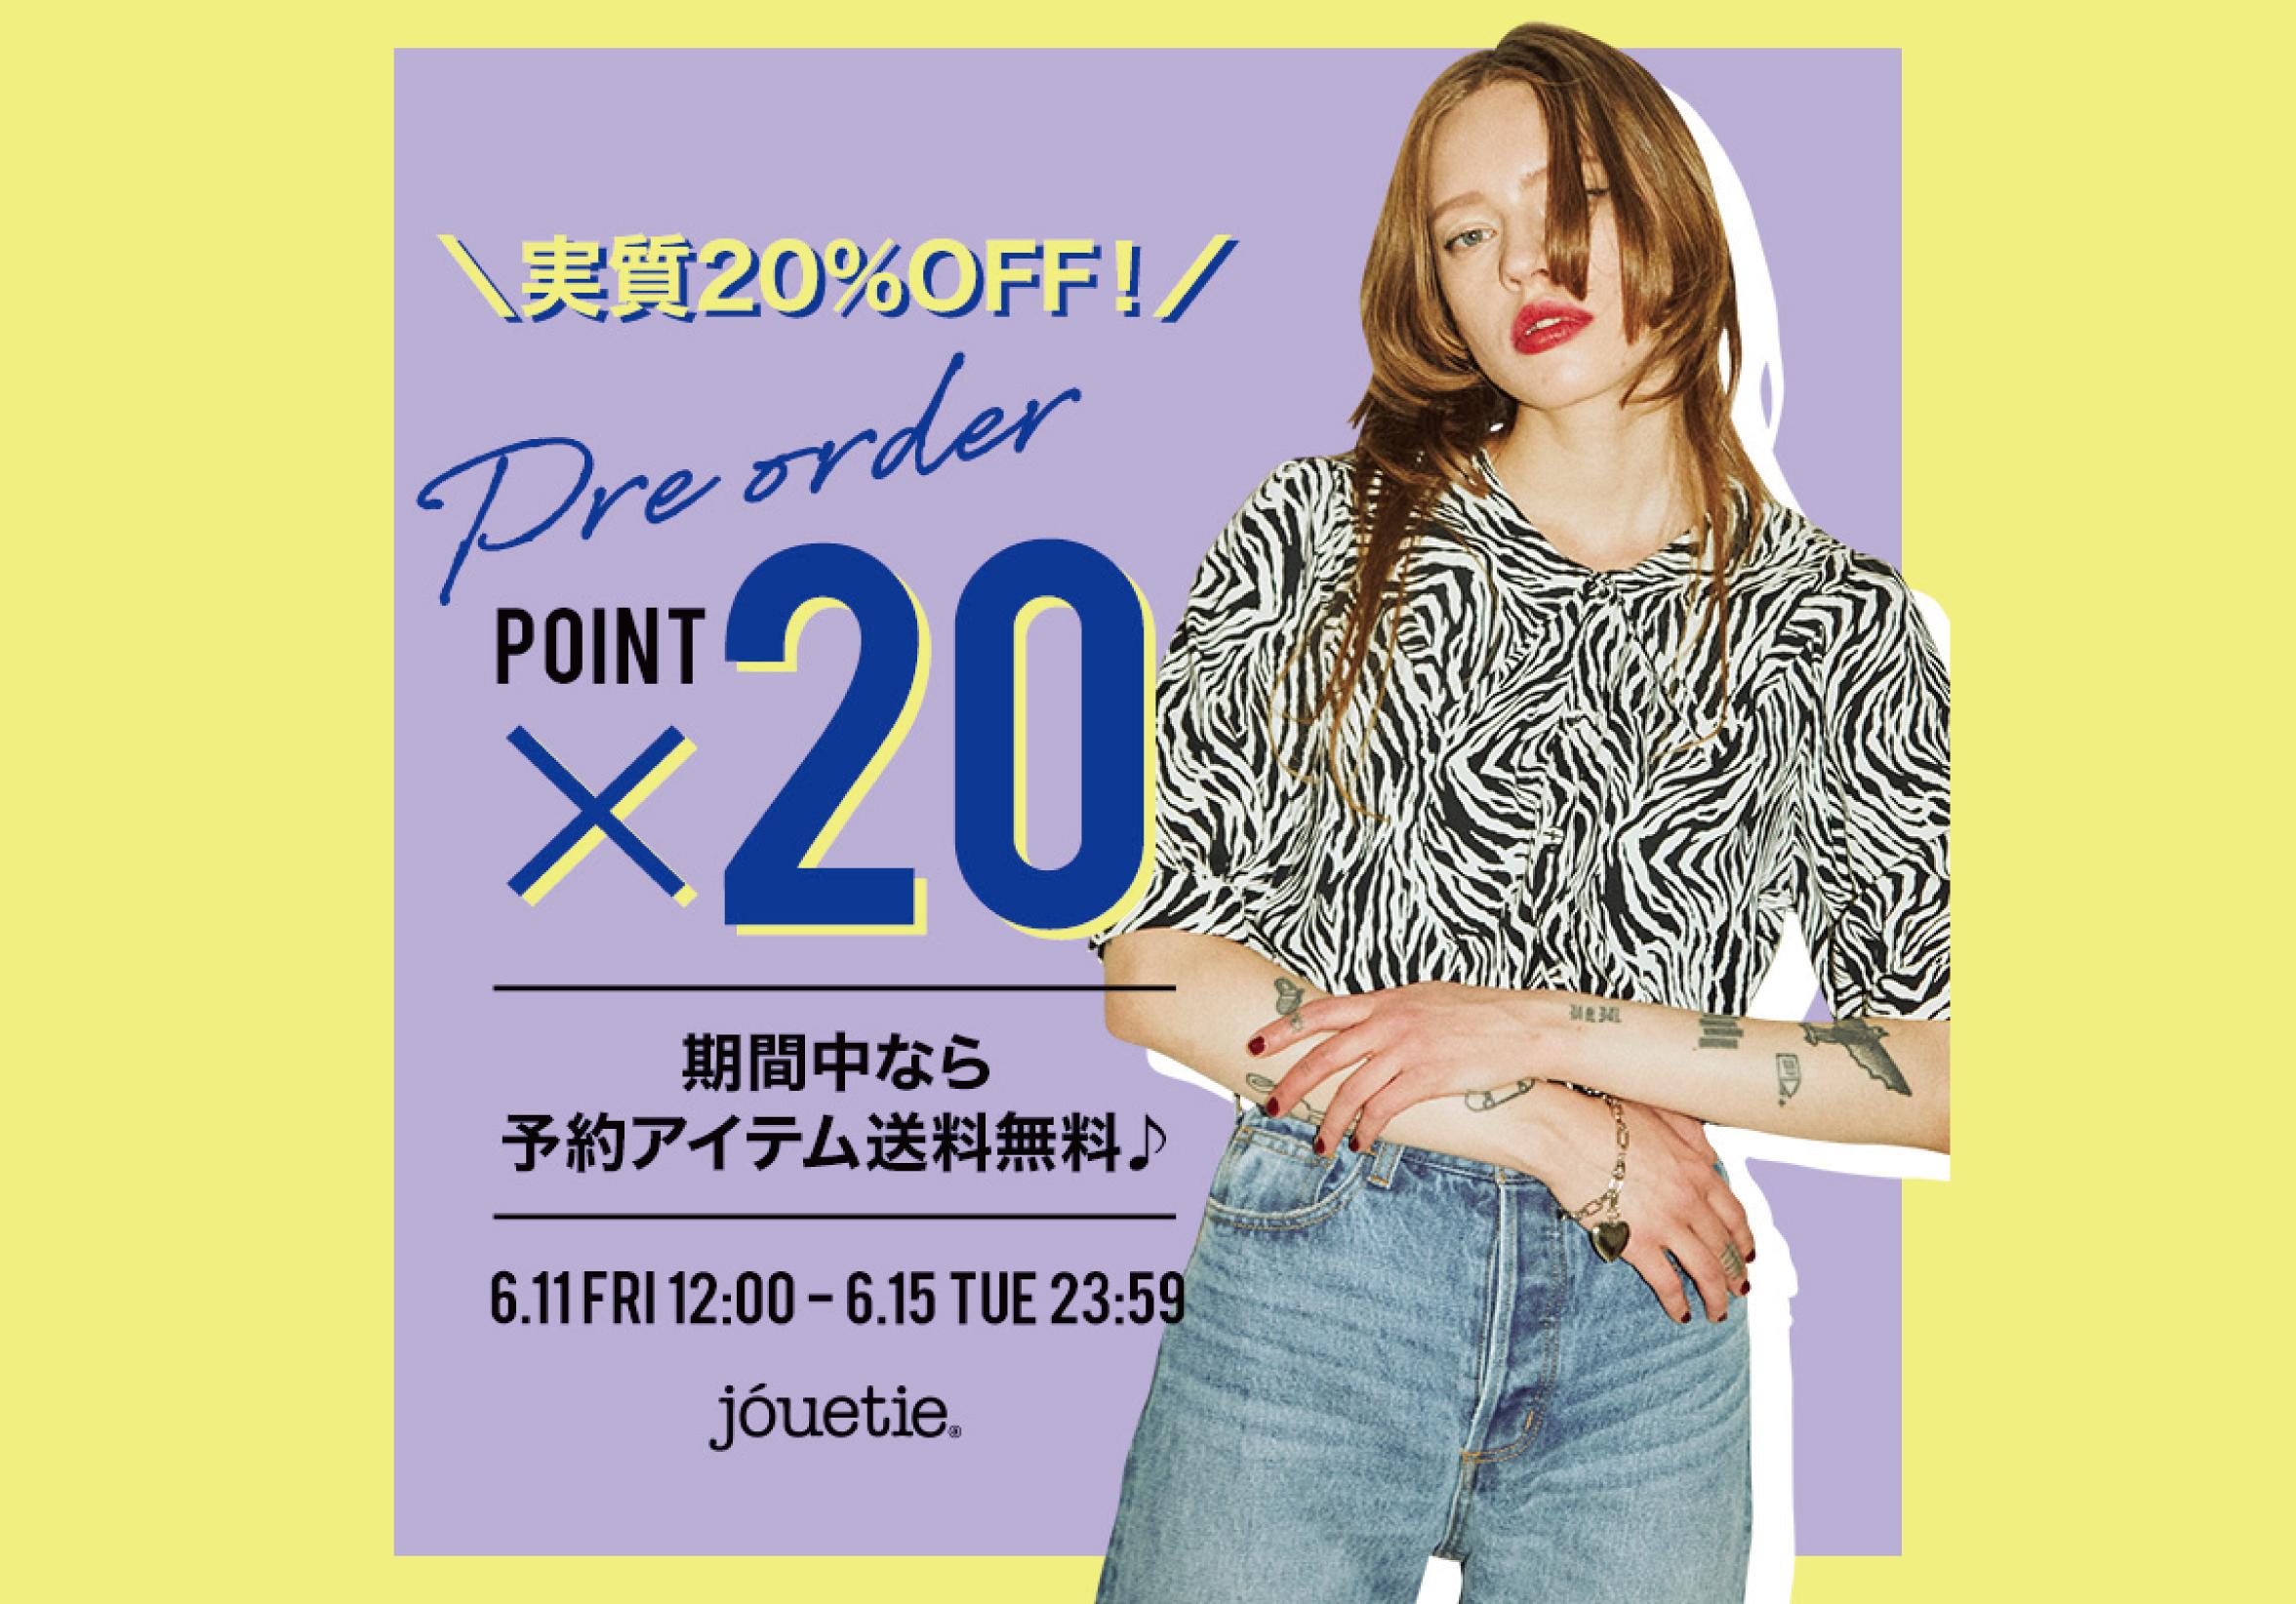 【PRE ORDER ITEM POINT×20!】